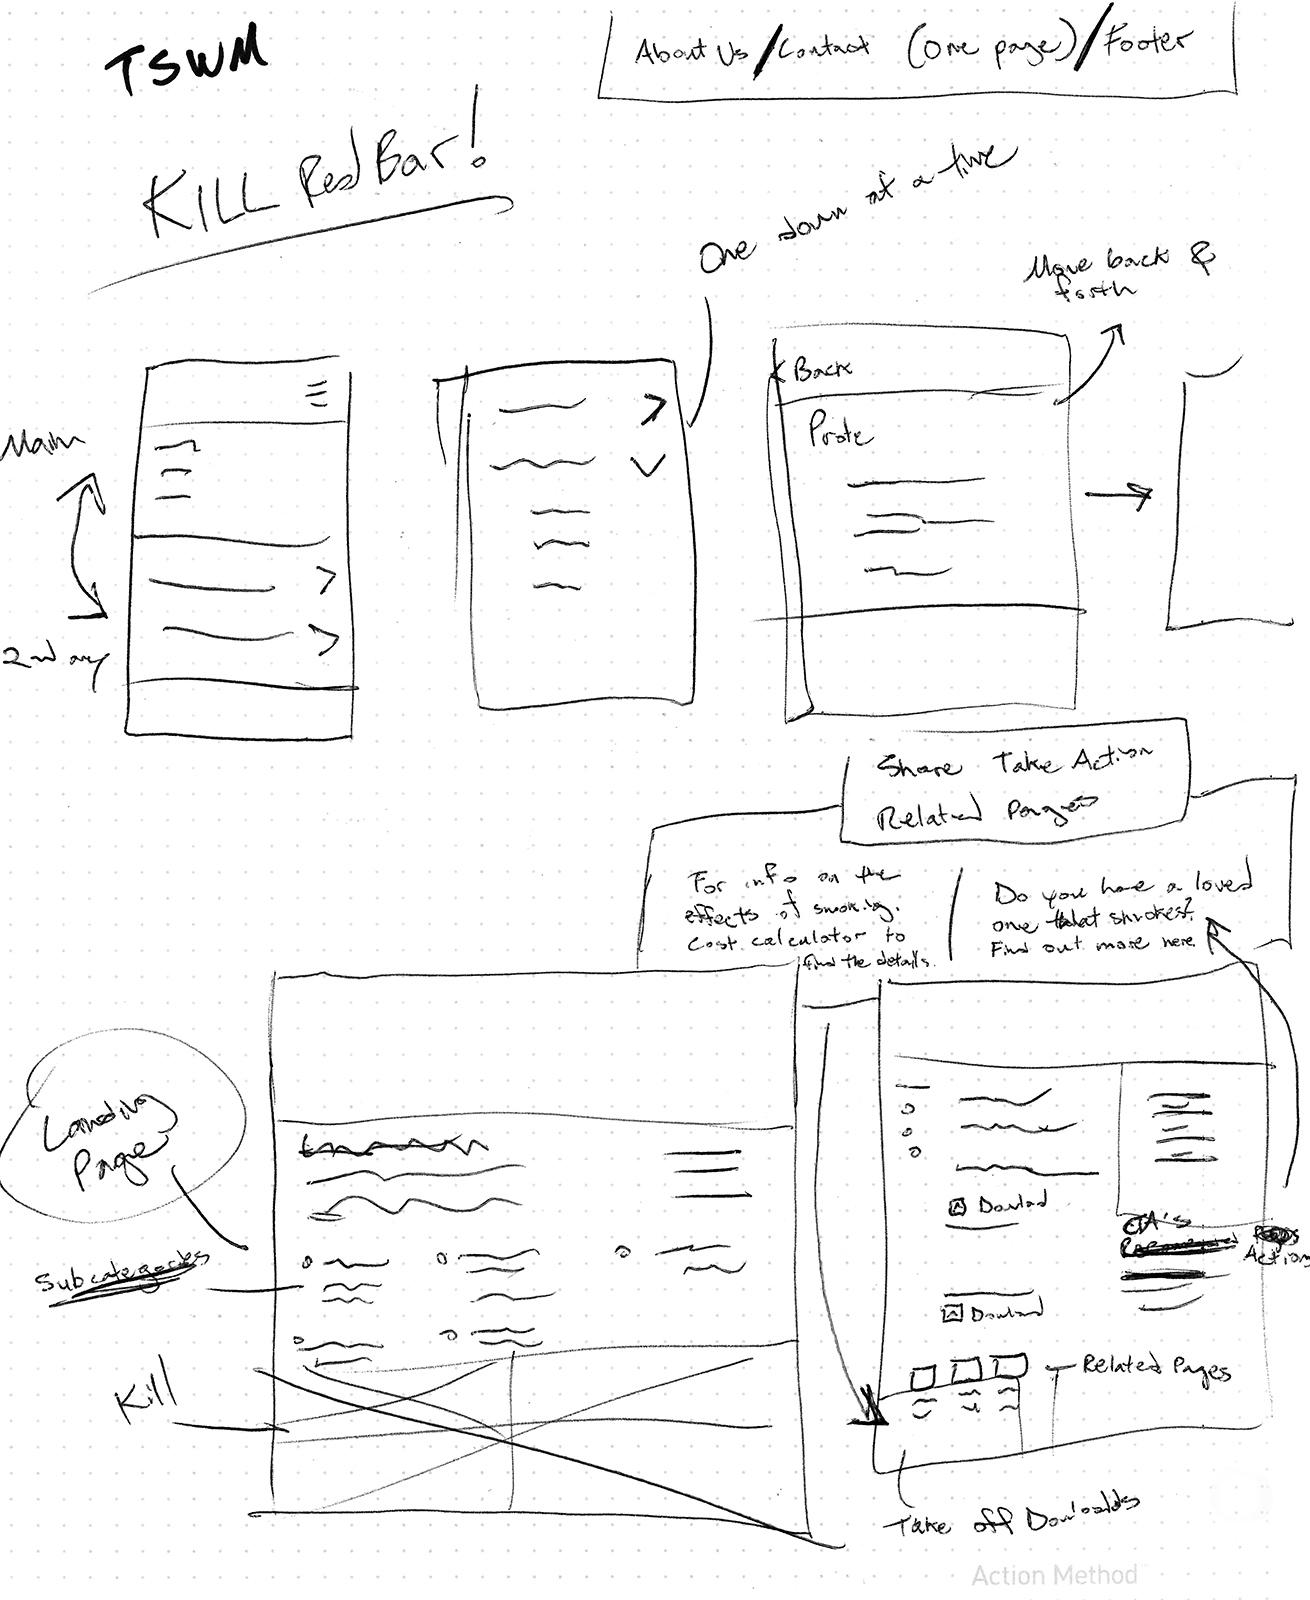 process-1.jpg